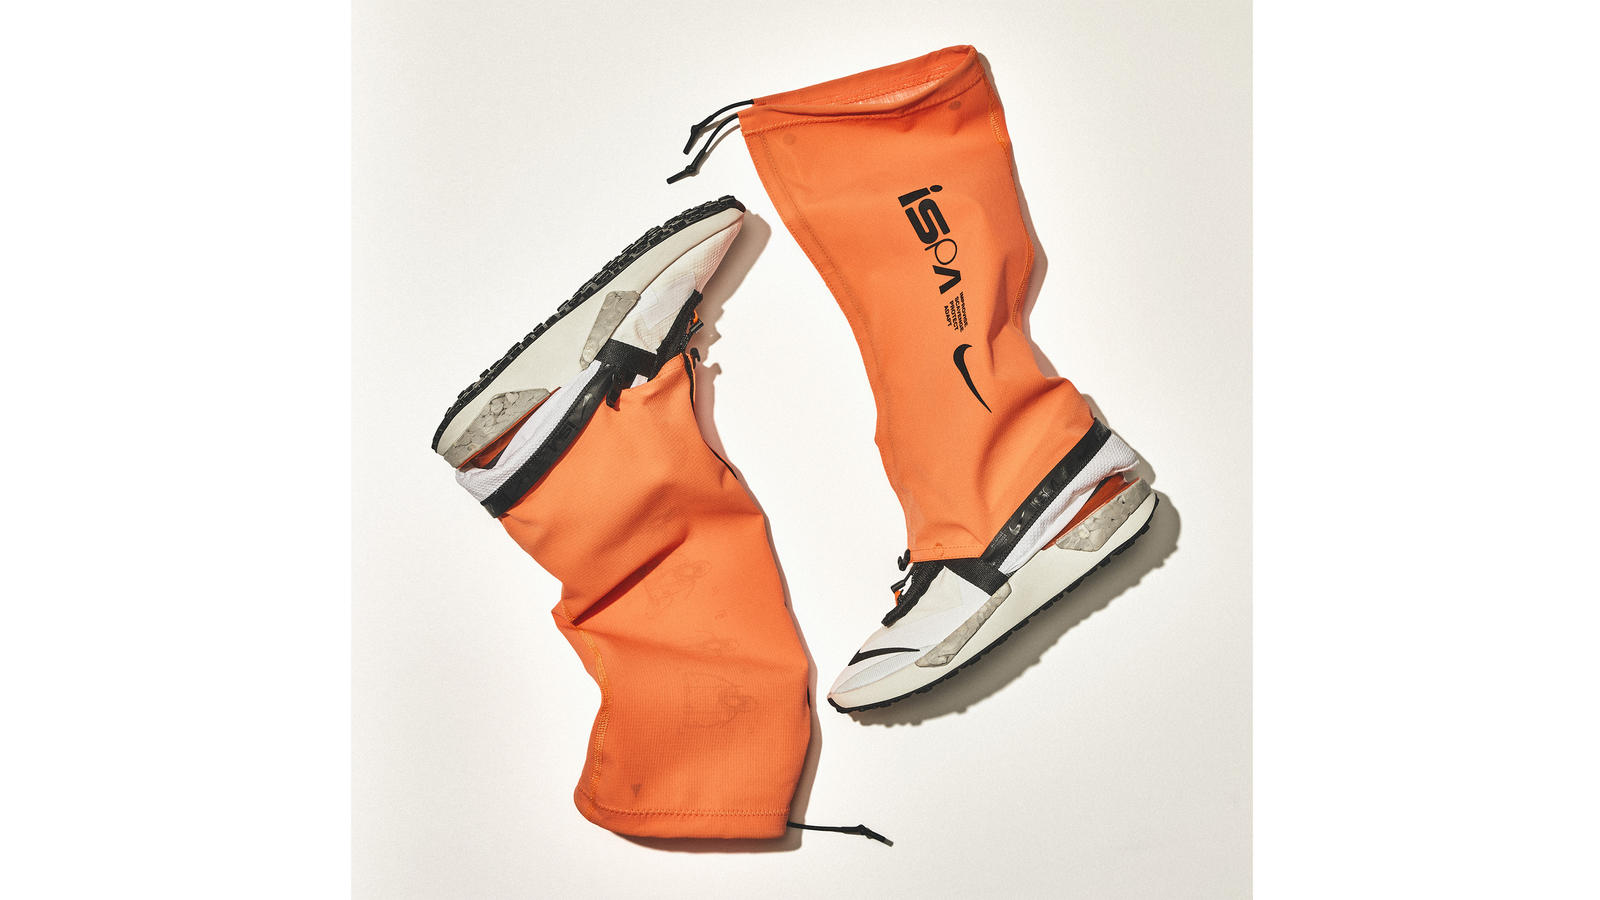 Nike ISPA Drifter Gator 8